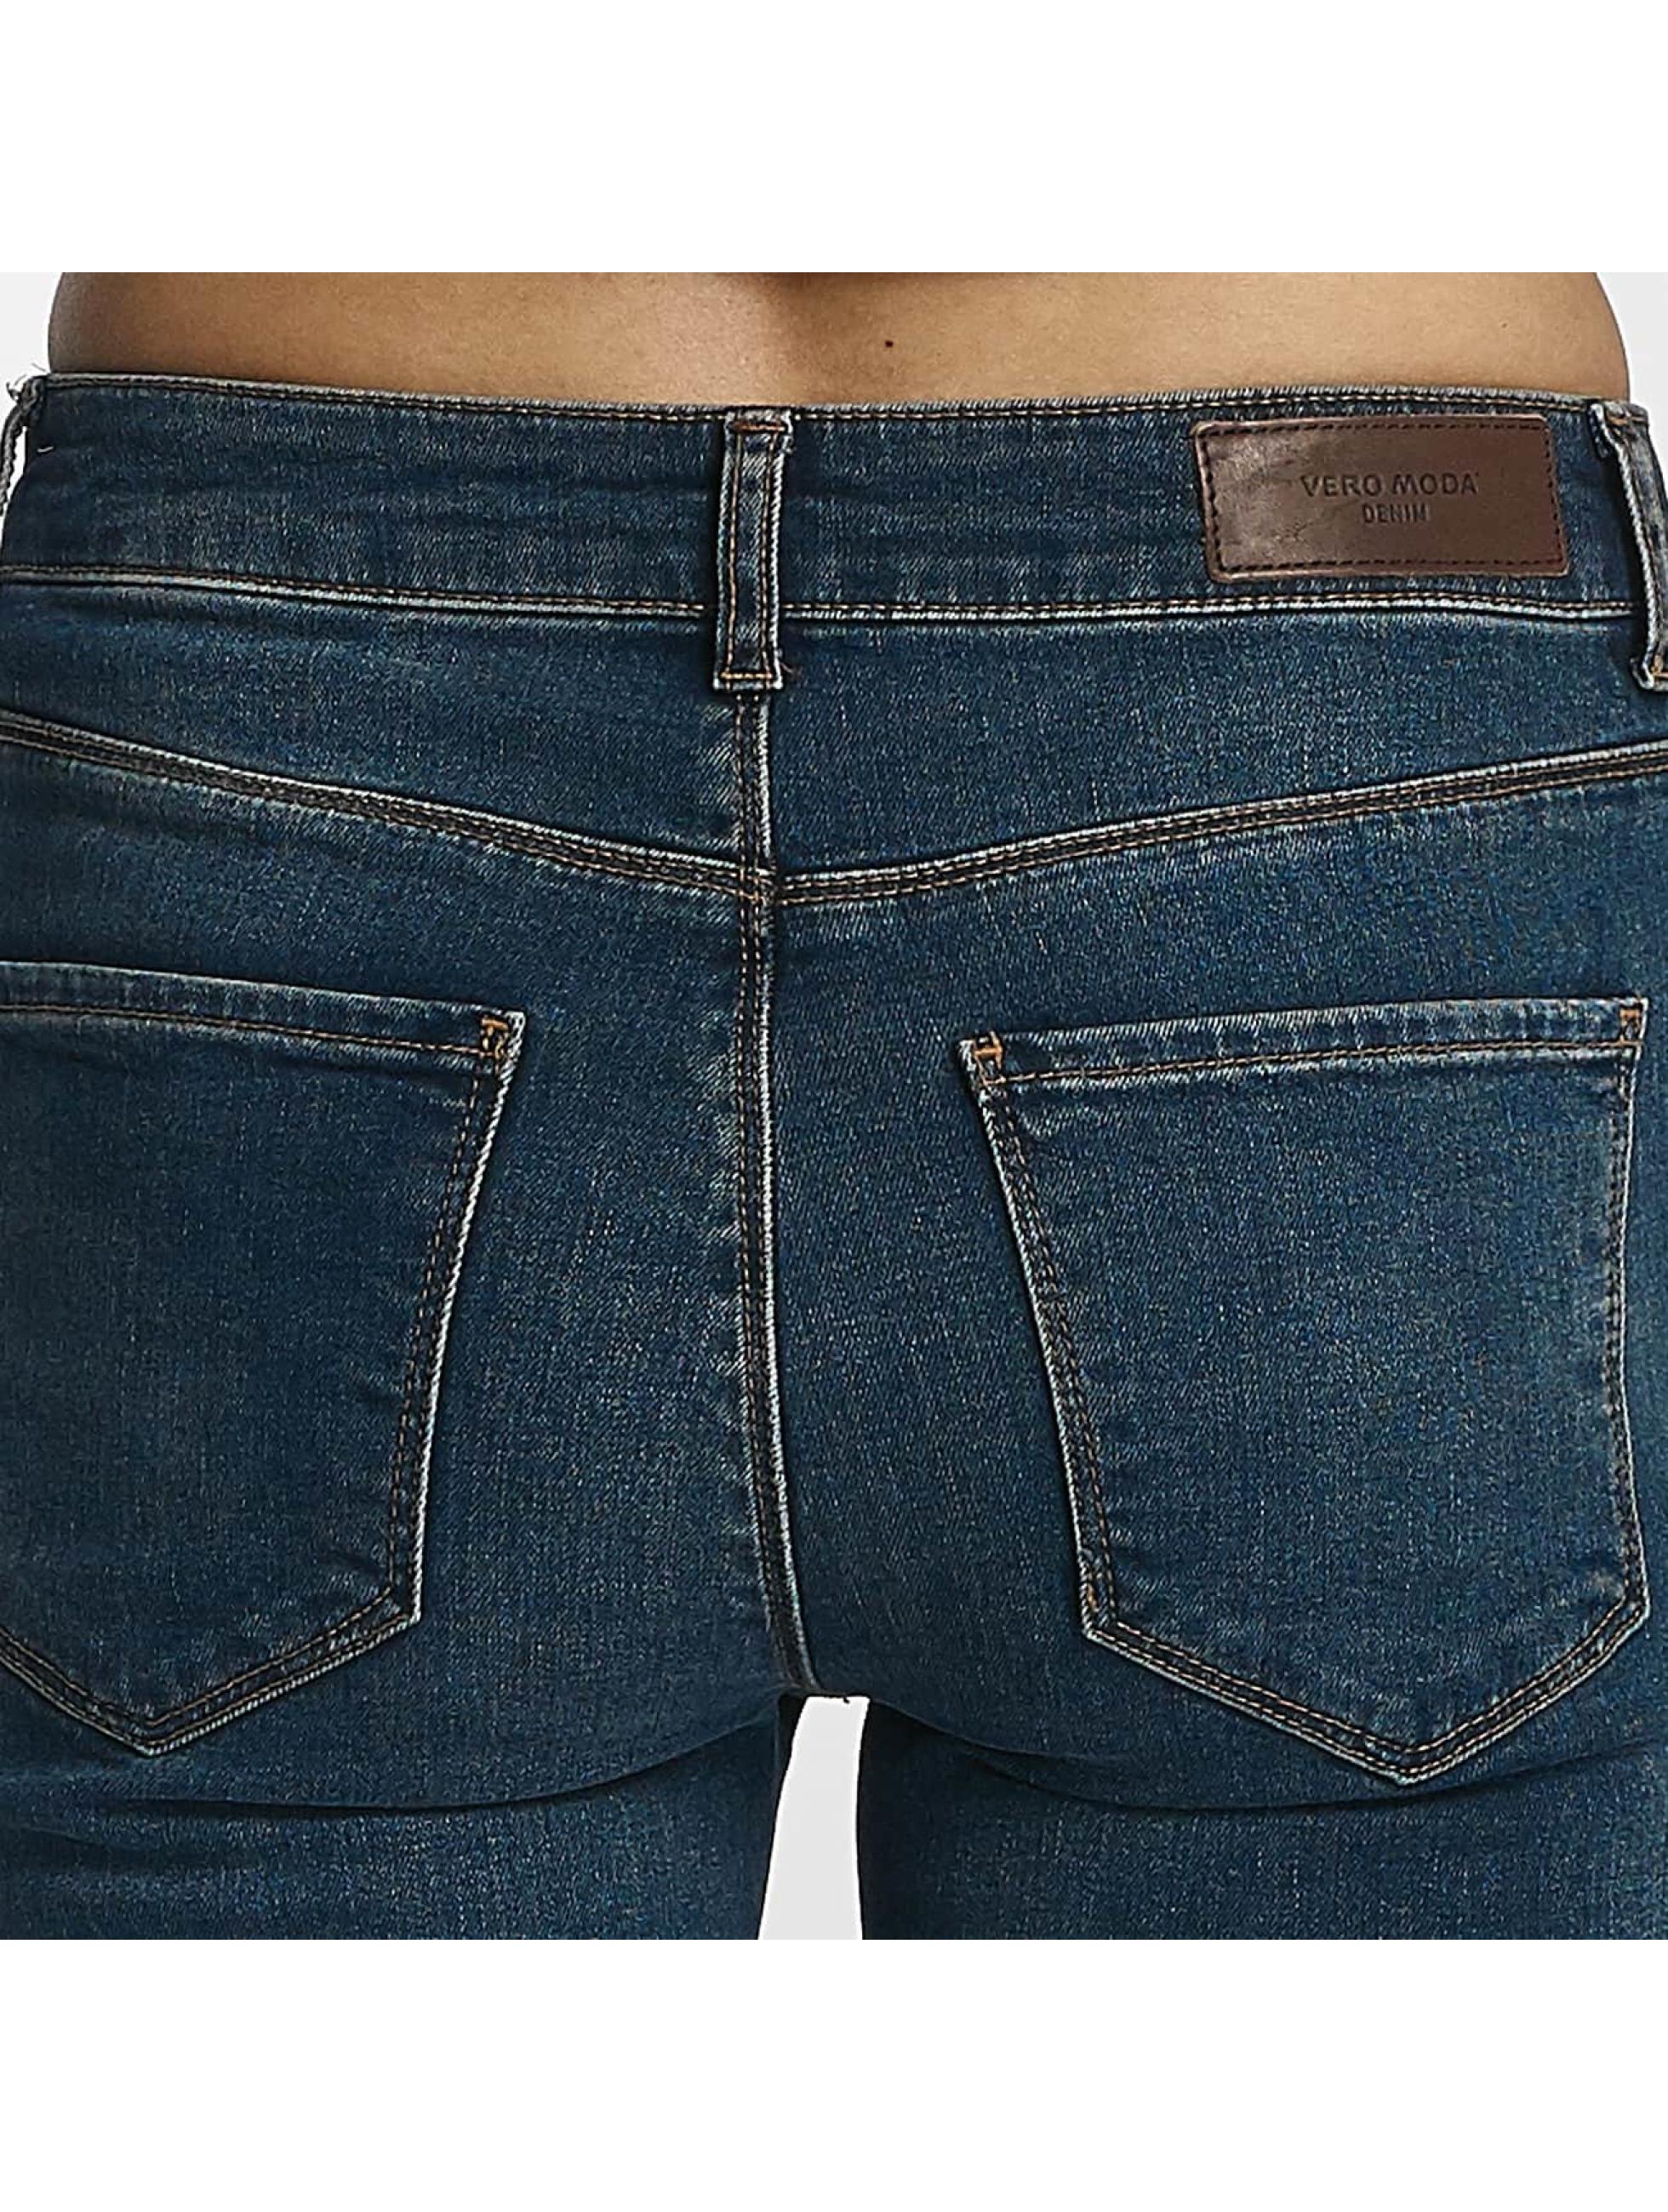 Vero Moda Jeans ajustado vmSeven Super Slim azul